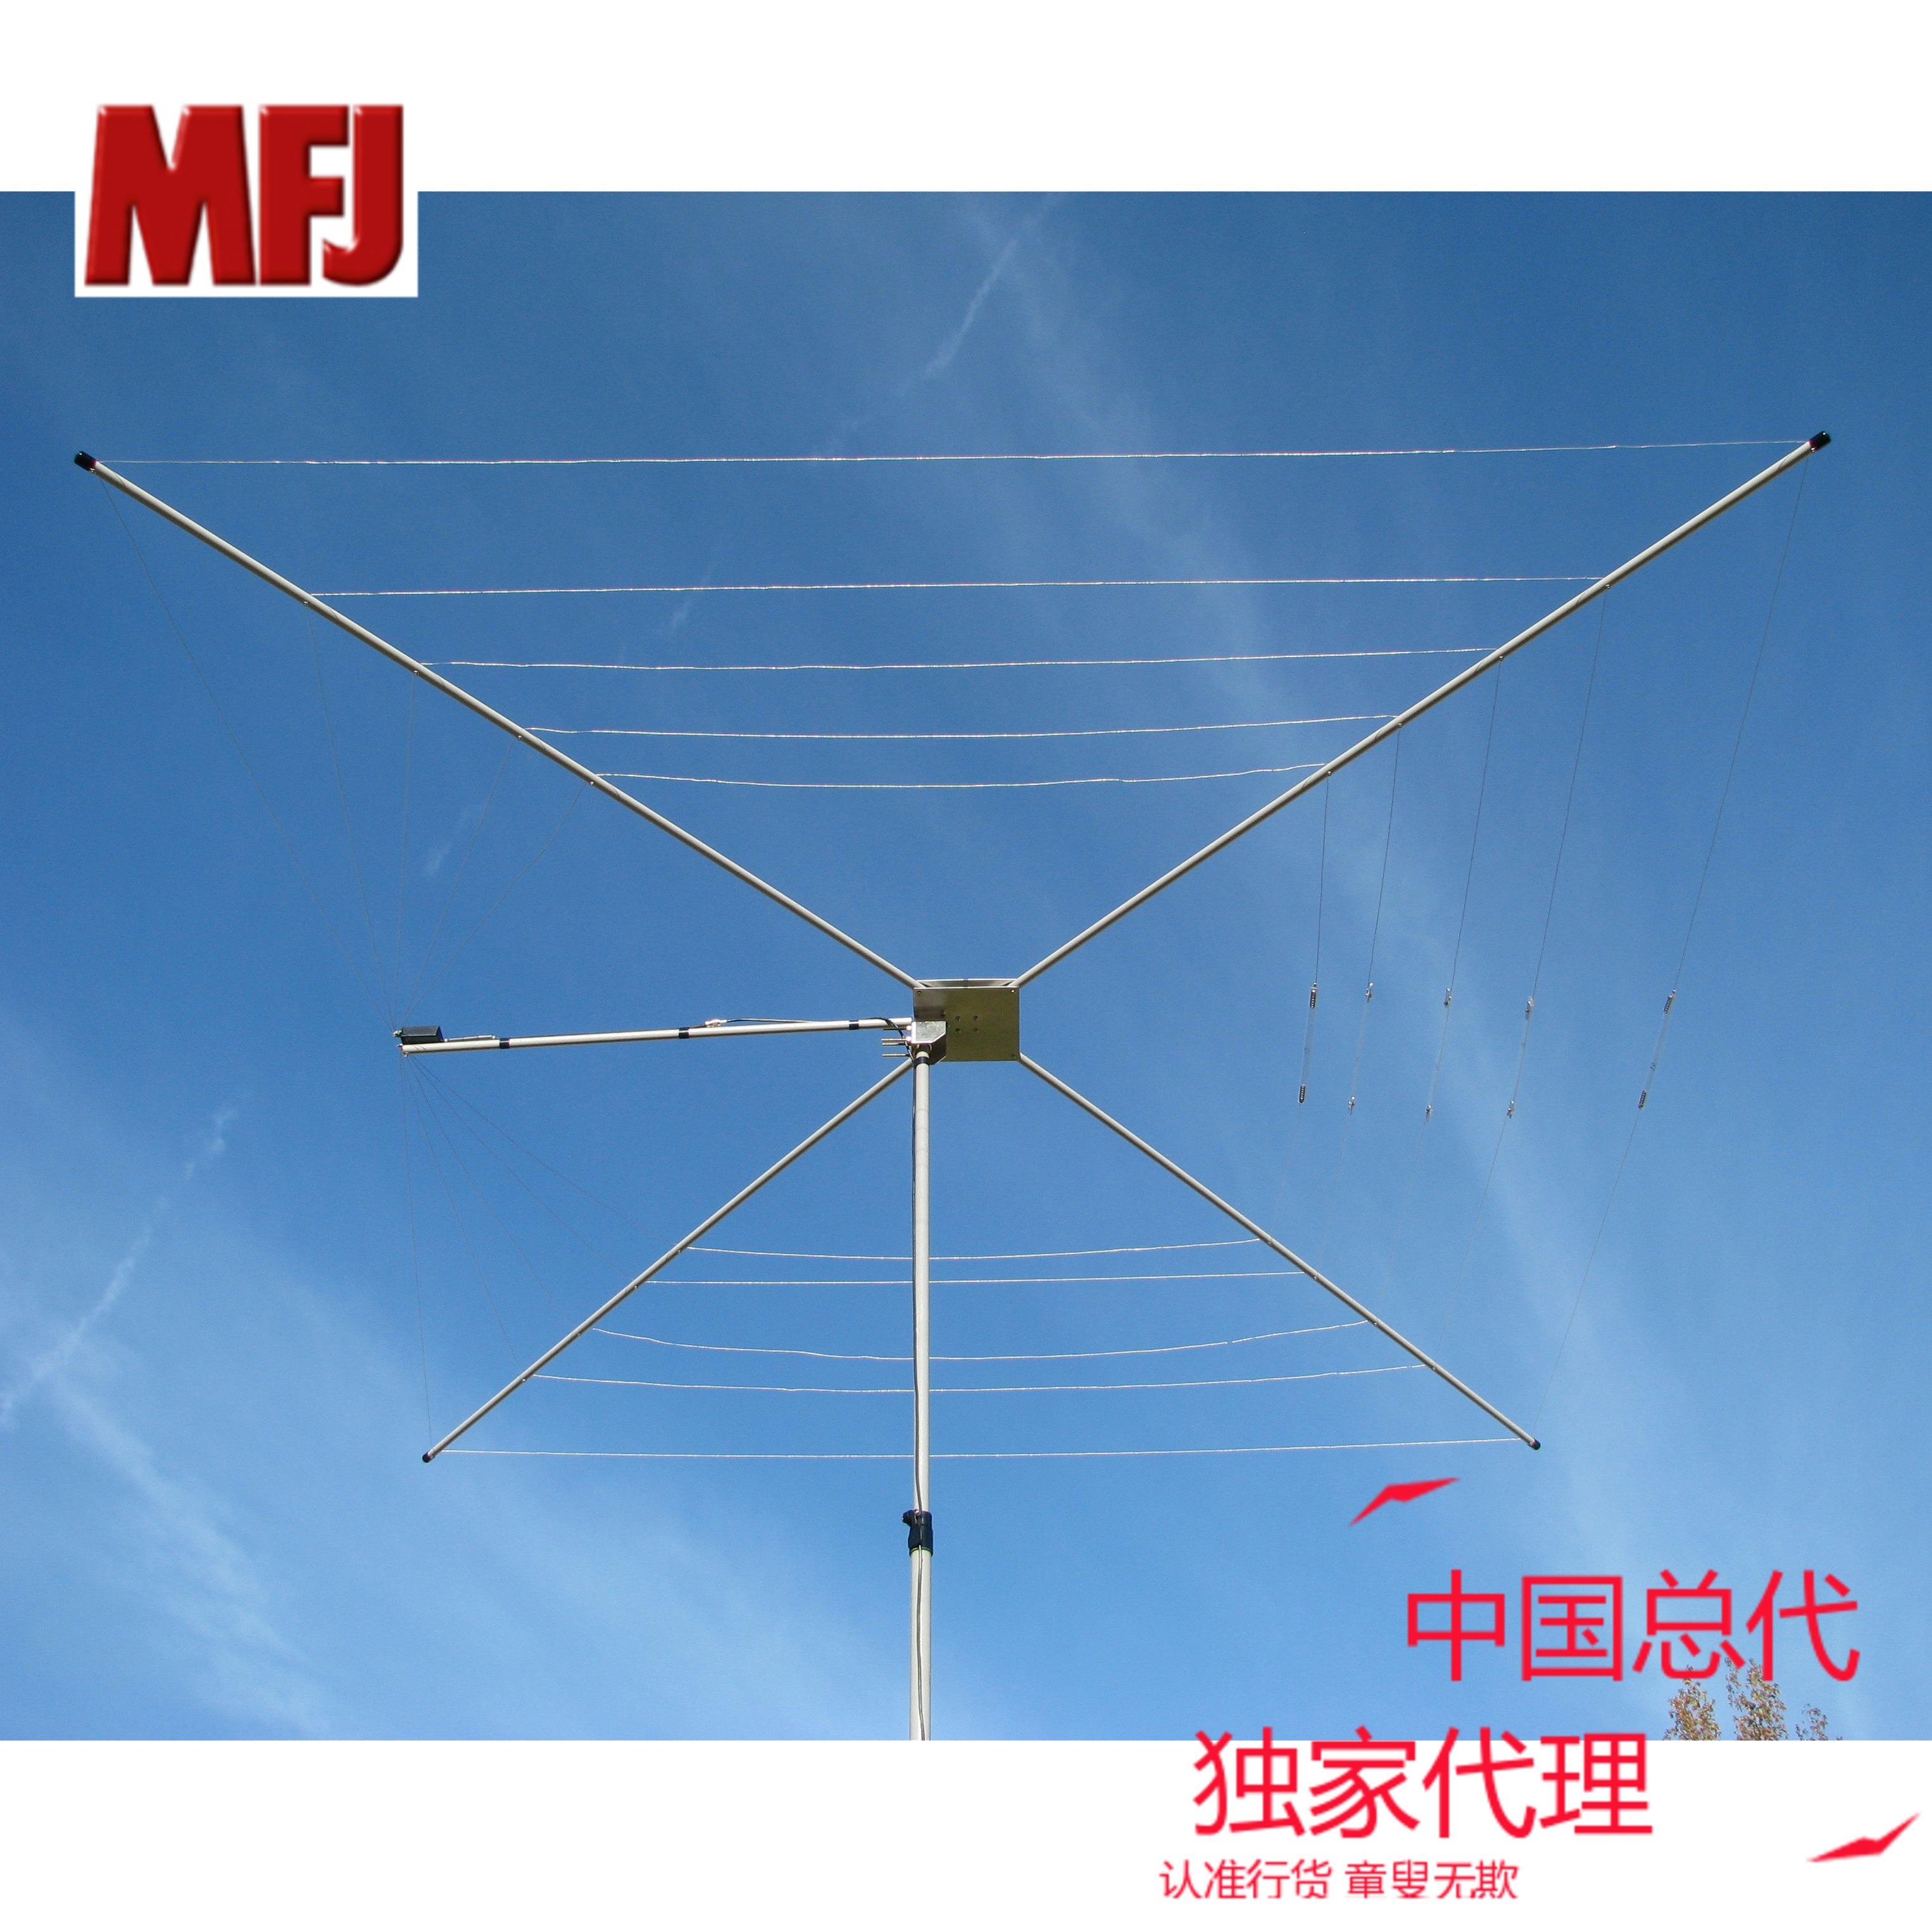 674 81] MFJ-1835 original cobweb antenna 5-band 300W from